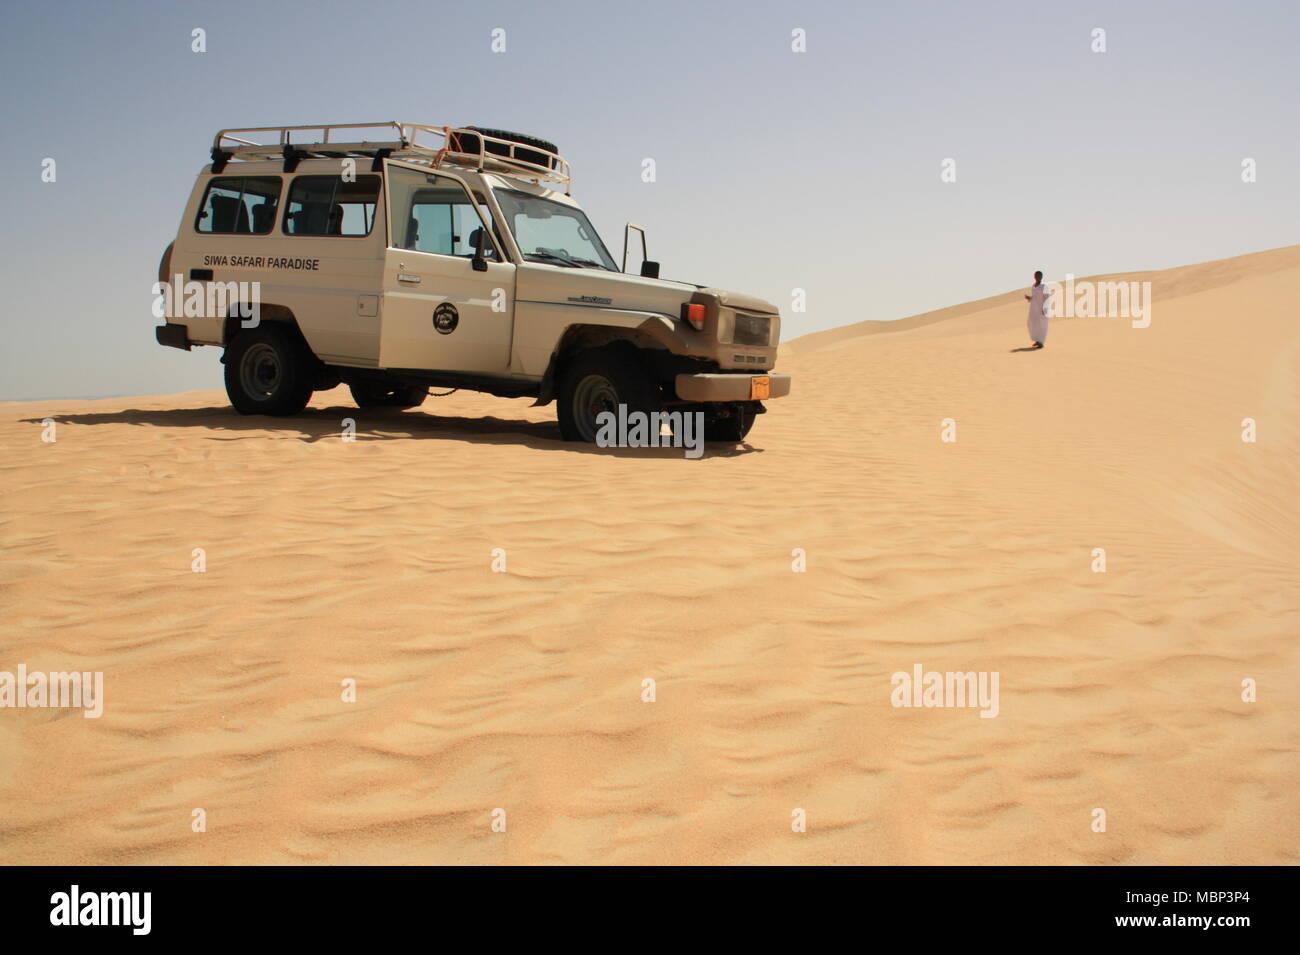 Short Break during a Sahara Desert Safari - Stock Image